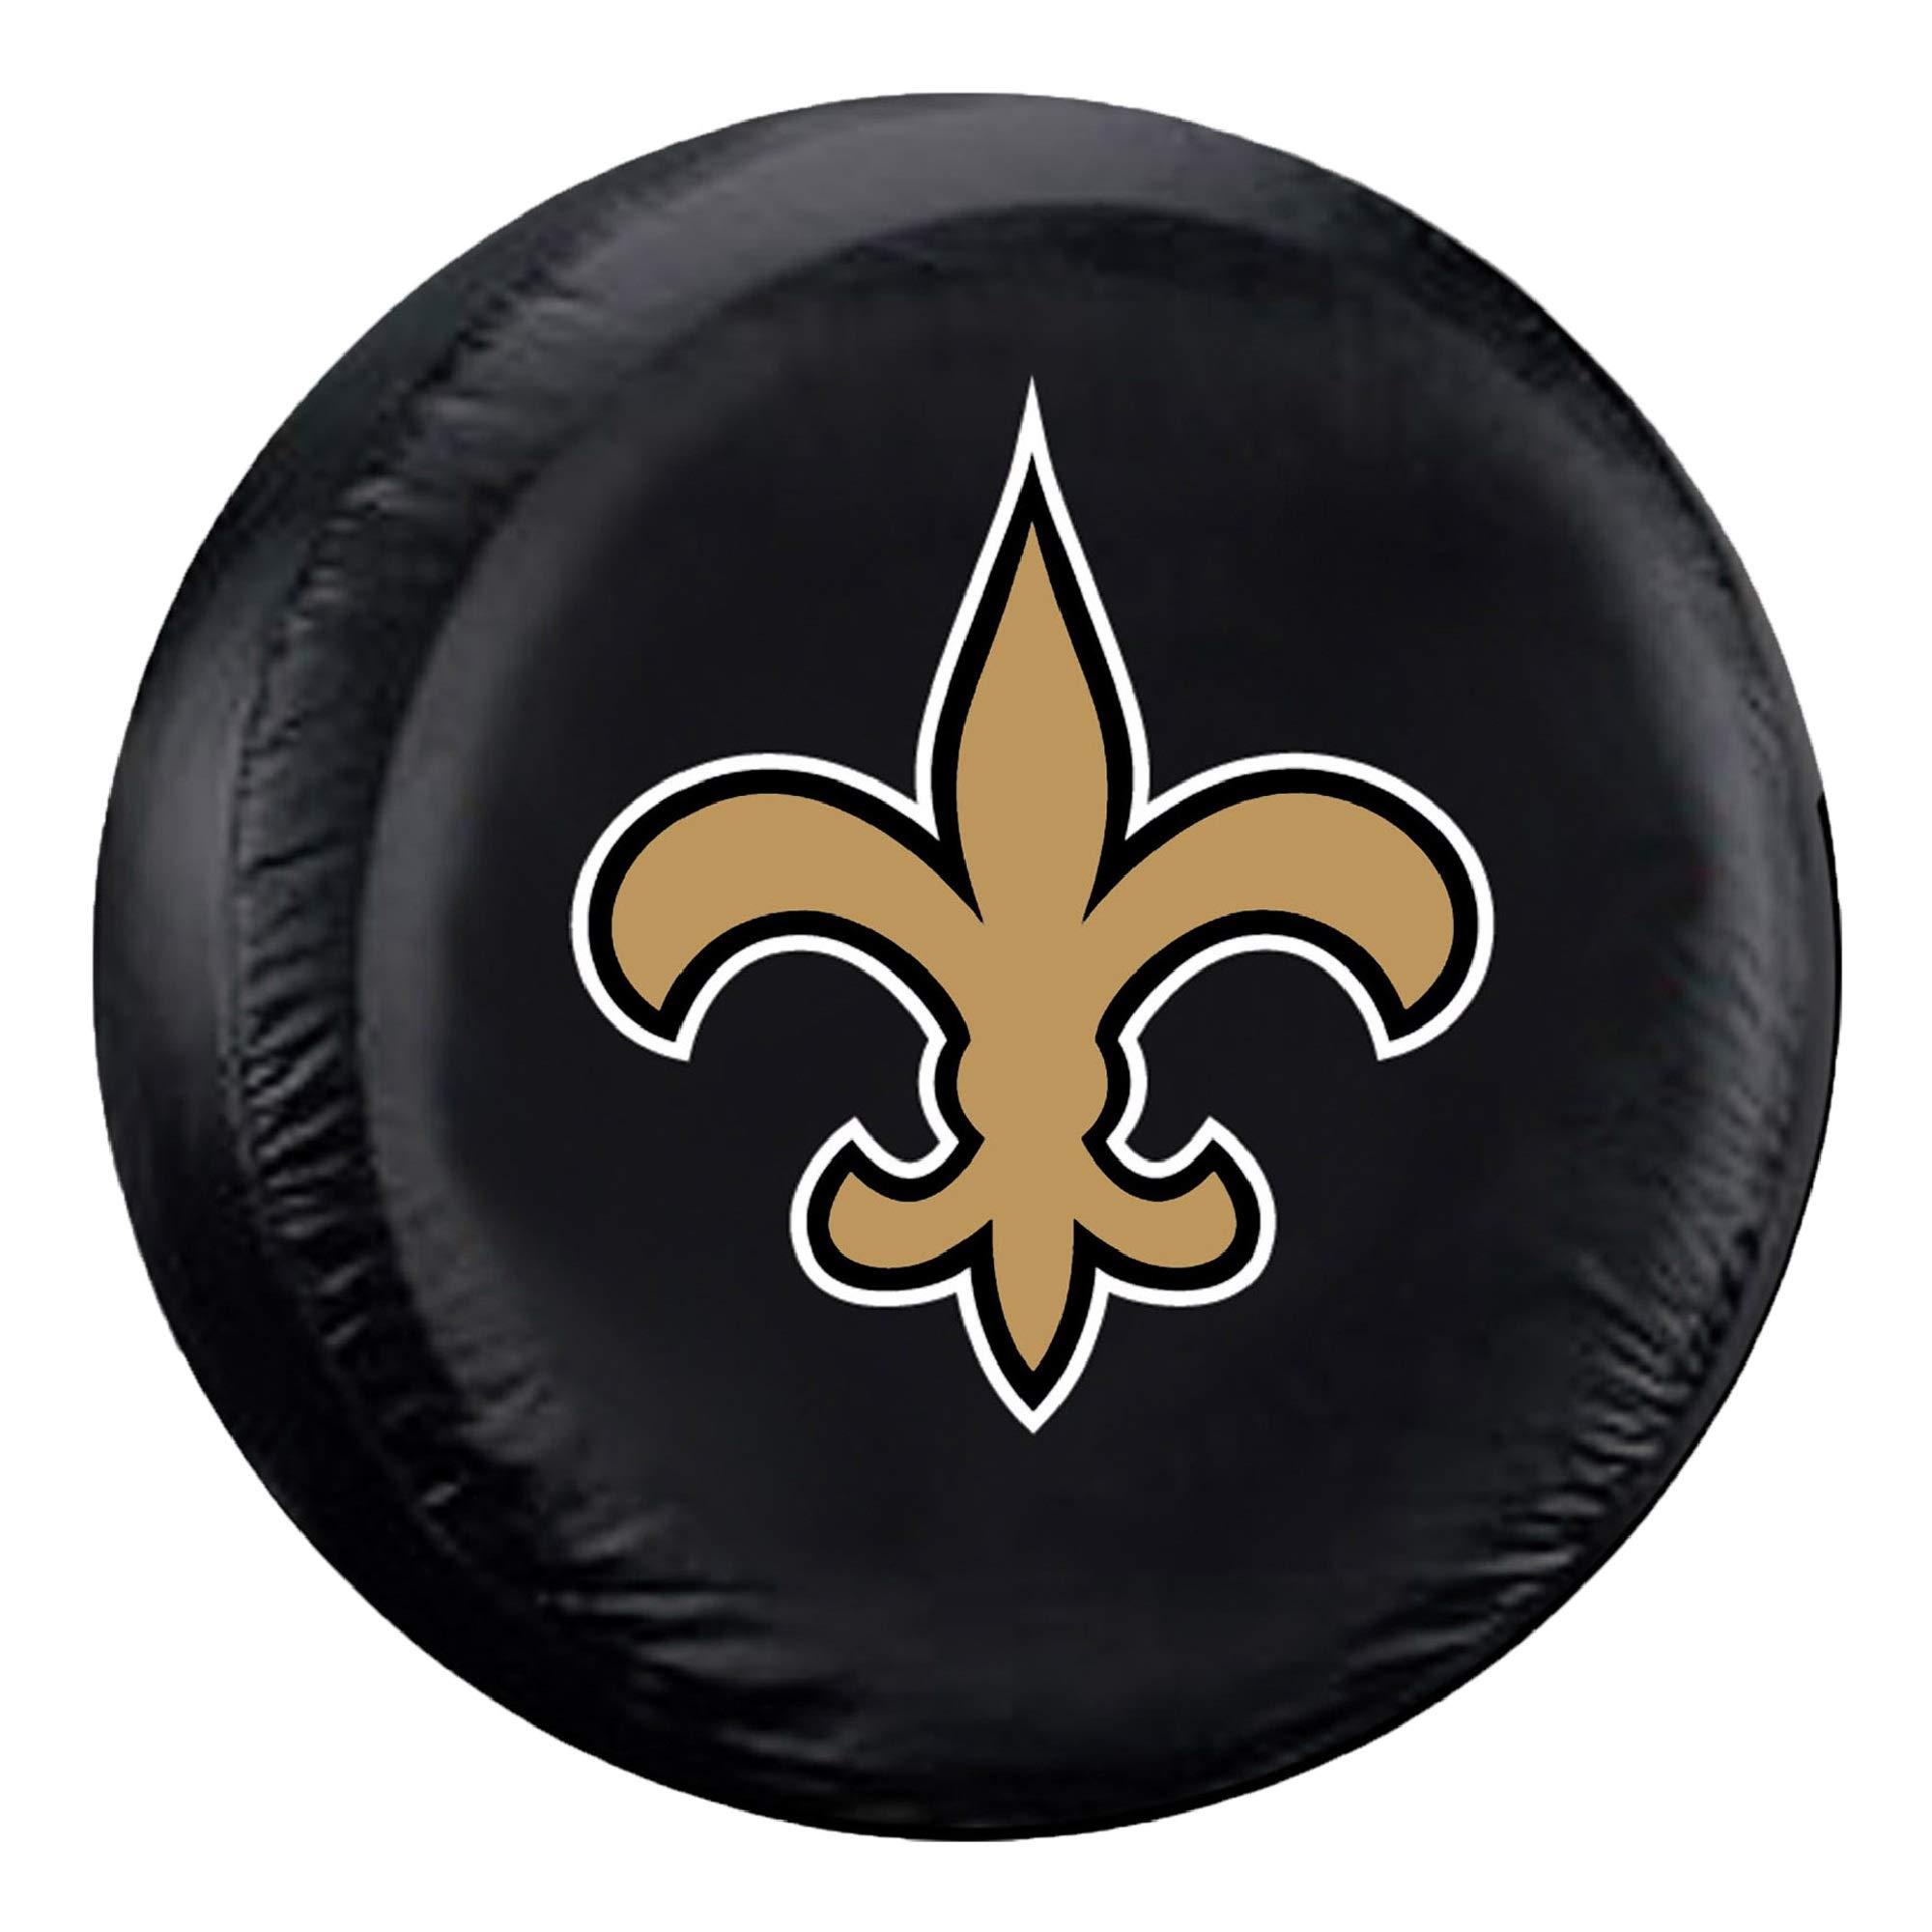 Fremont Die NFL New Orleans Saints Tire Cover, Large Size (30-32'' Diameter) by Fremont Die